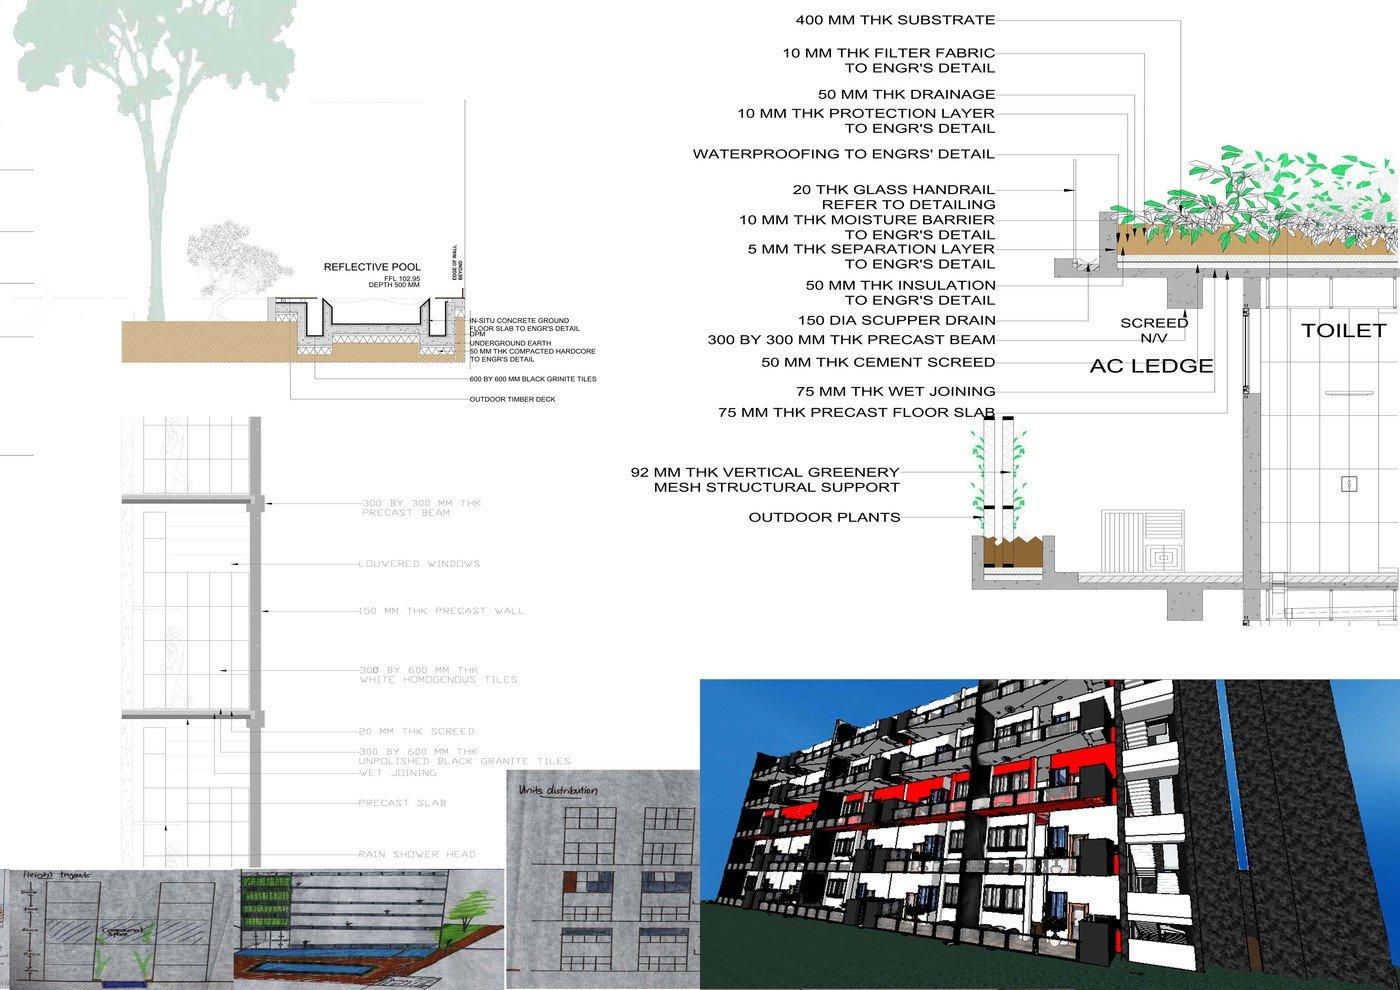 Year 2 by Sonia Alexandrea Vimal Kumar at Coroflot com